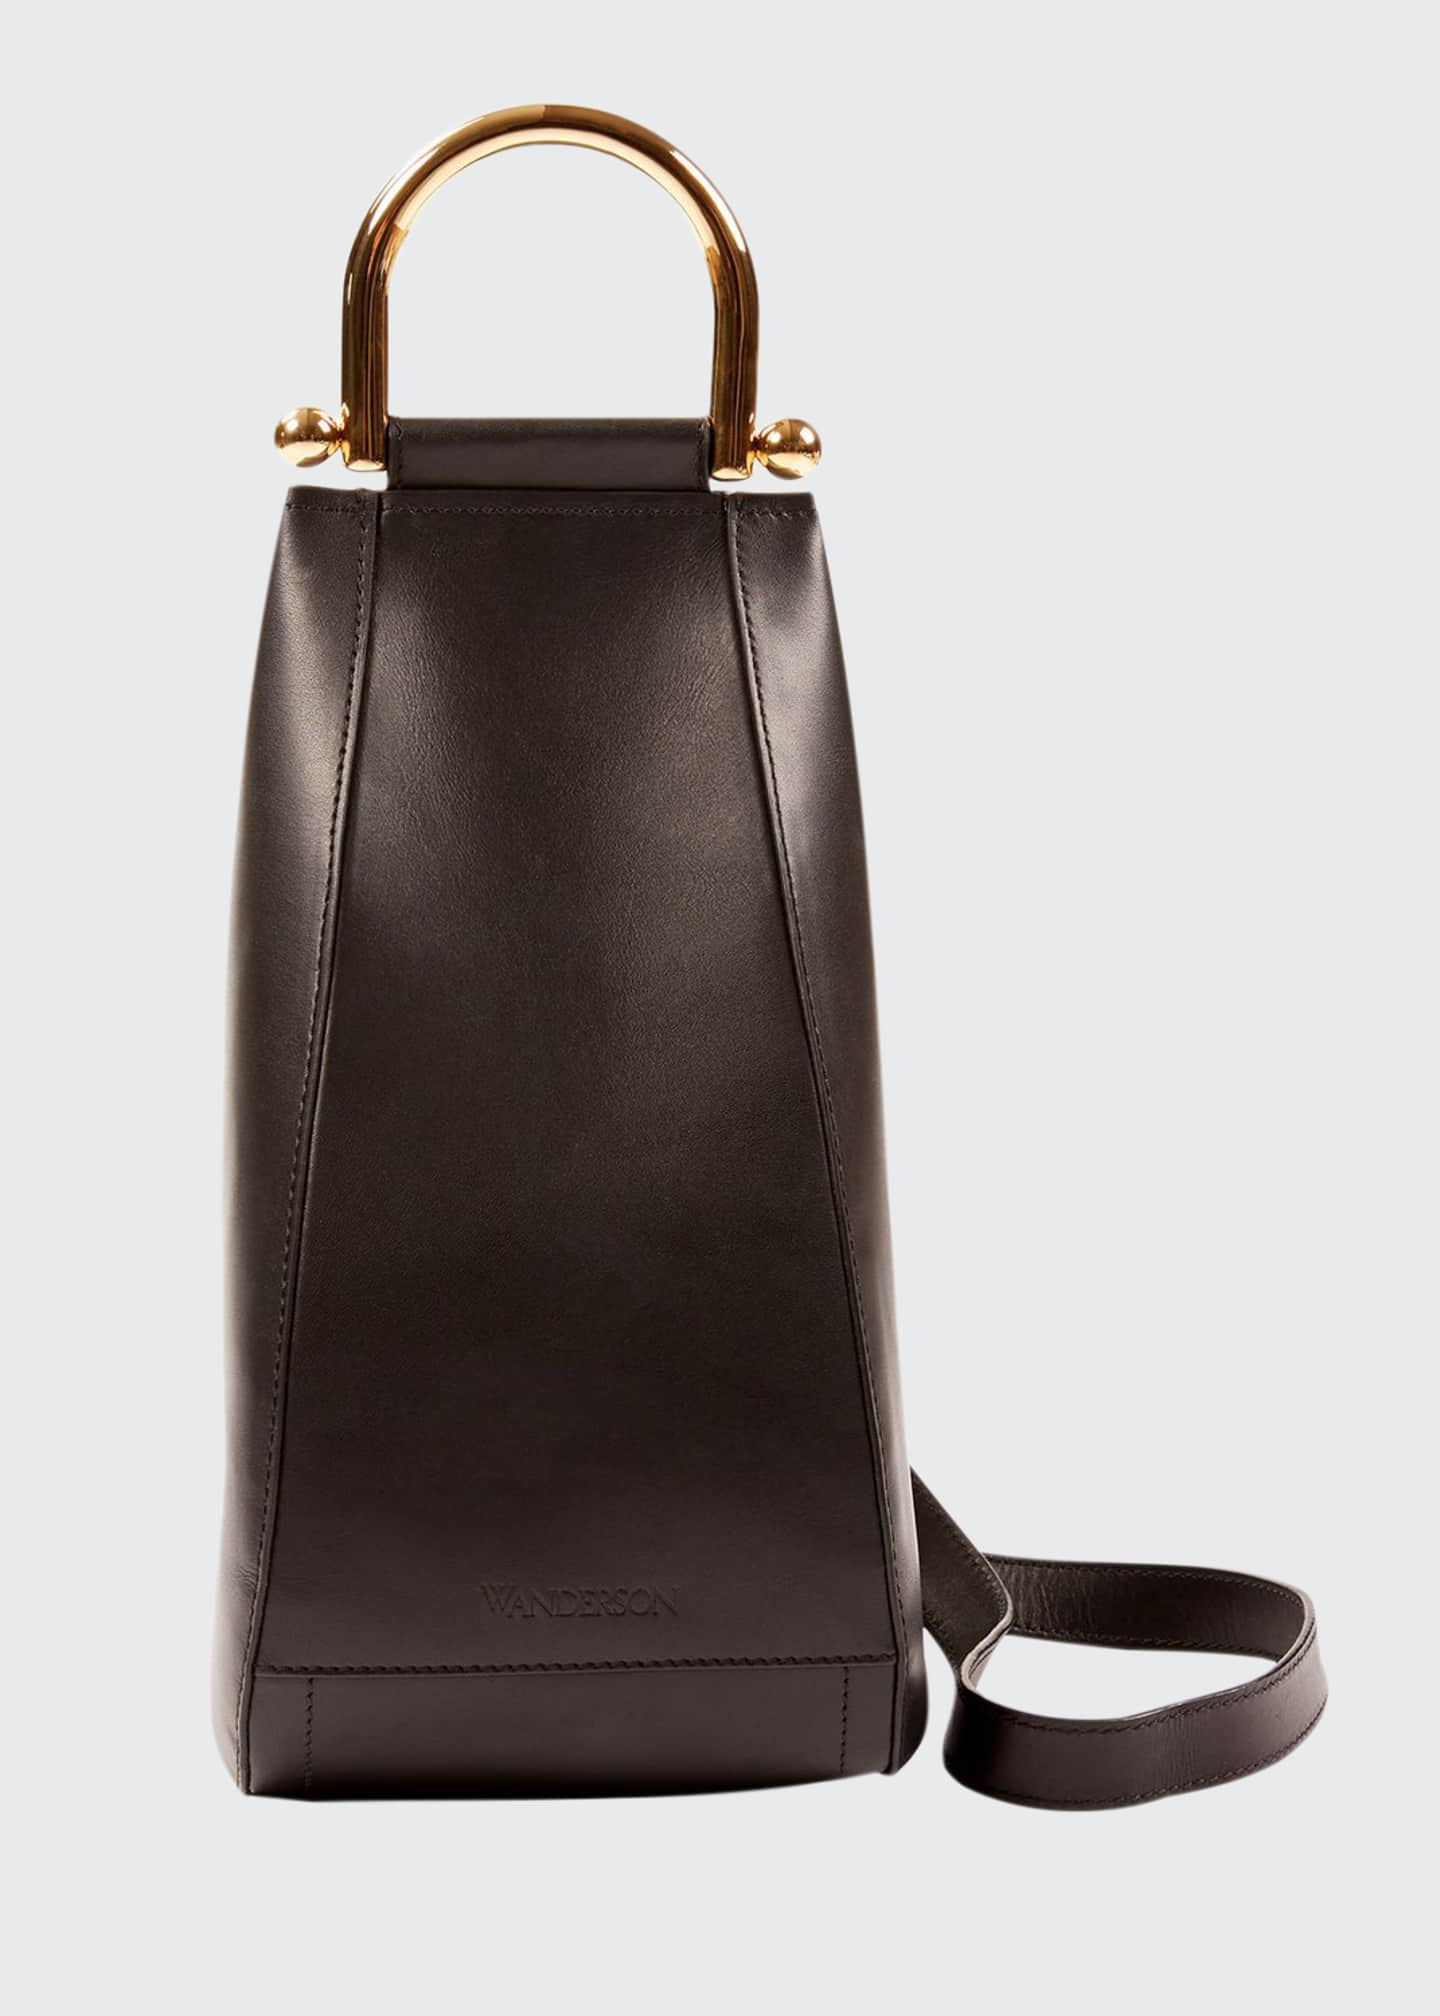 JW Anderson Smooth Wedge Shoulder Bag